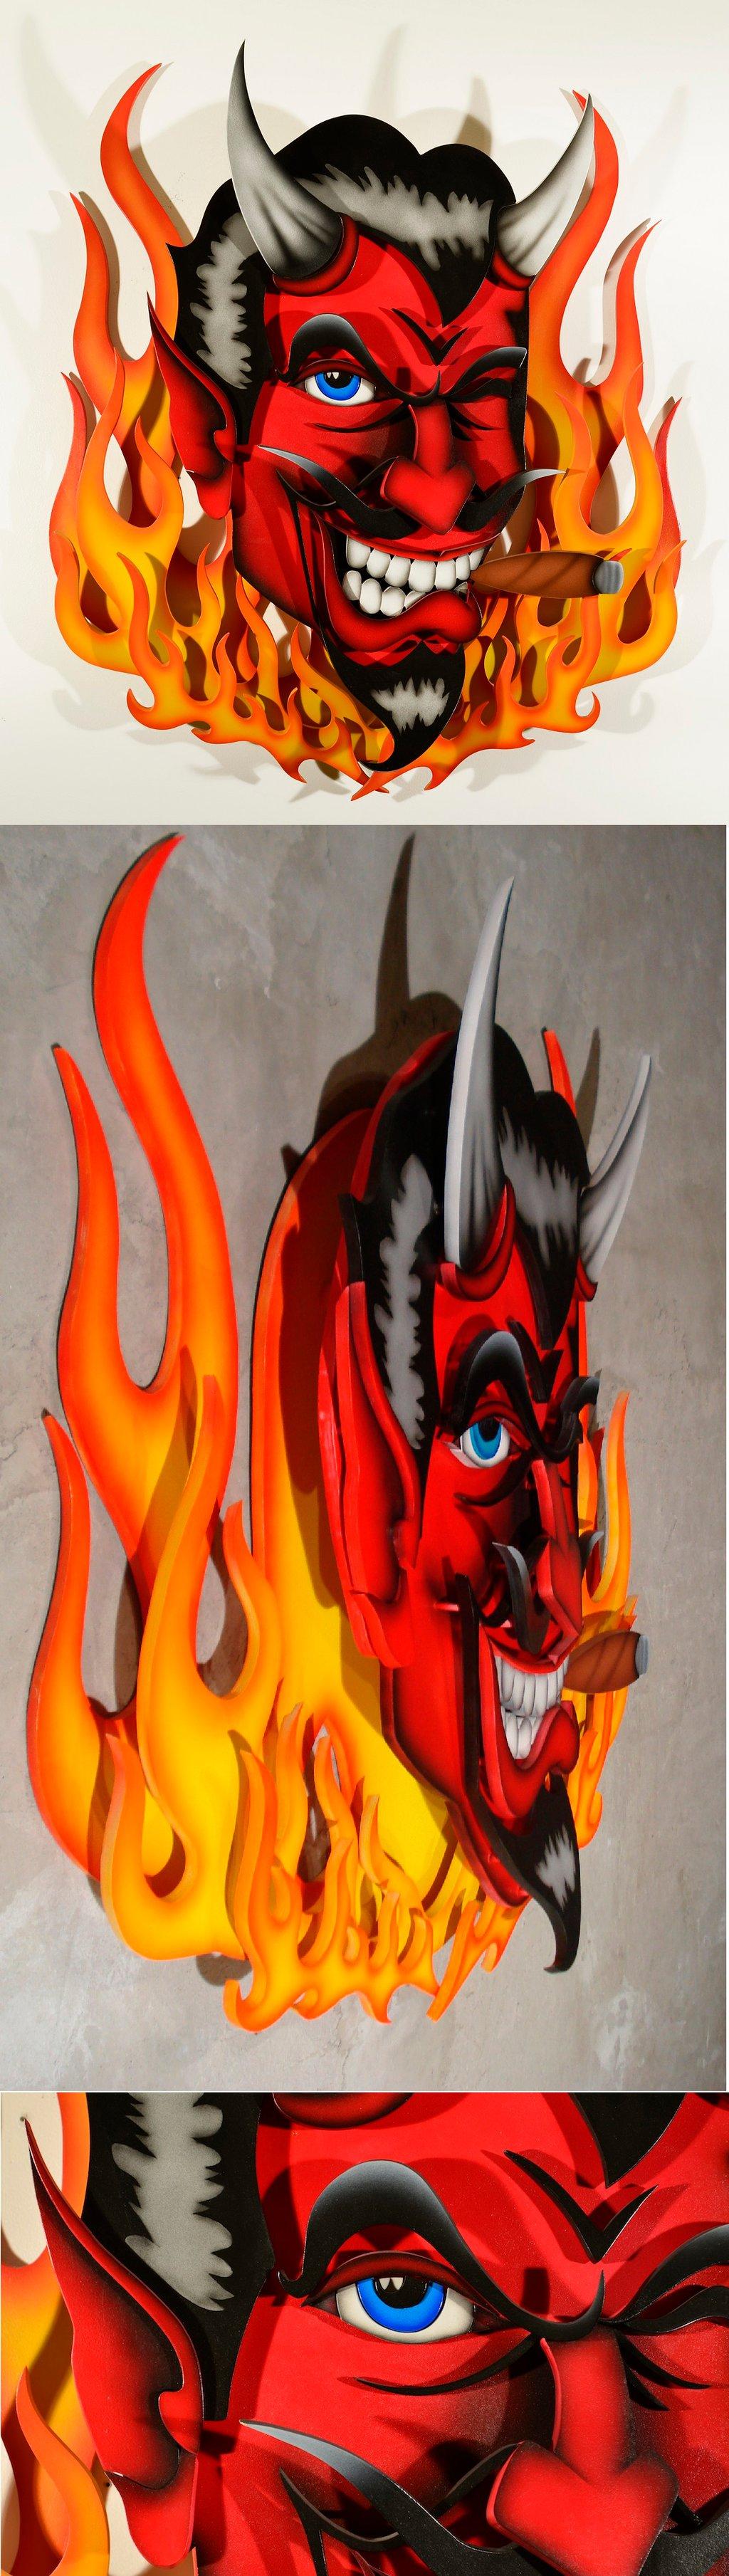 Graffiti art on wood - Live Evil By Drewstormgraham Deviantart Com On Deviantart 3d Wooden Graffiti Art